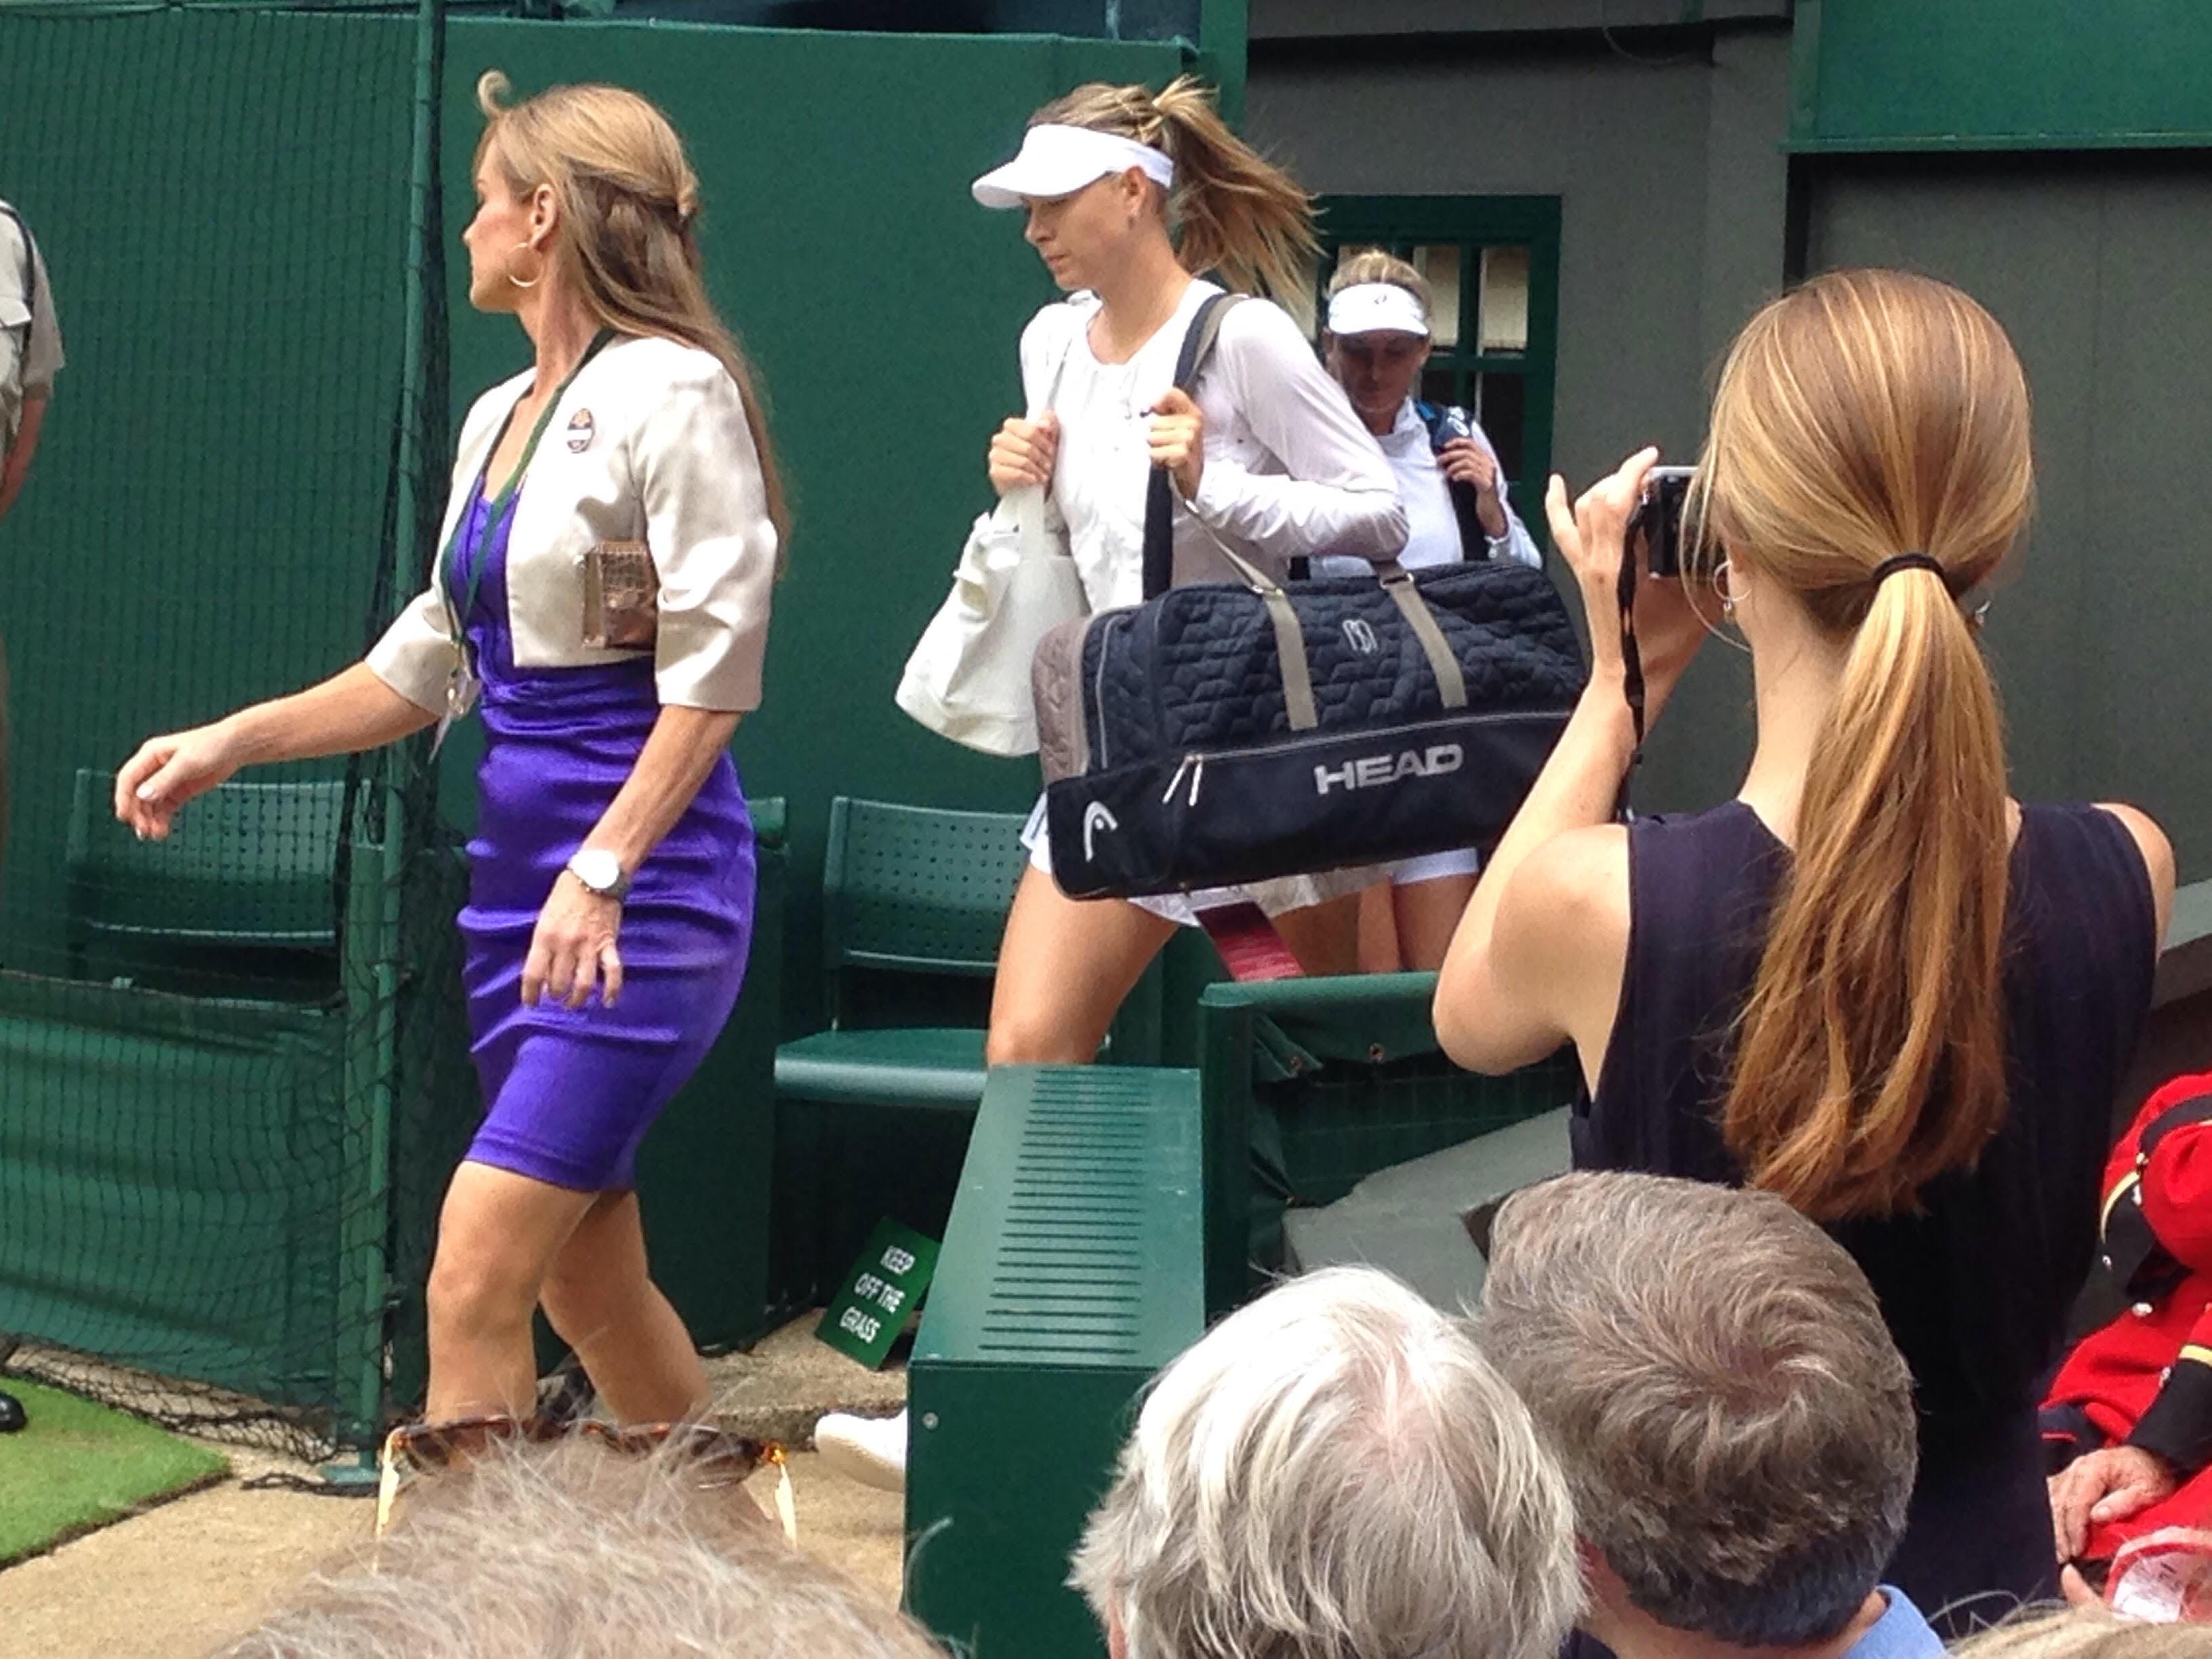 Maria Sharapova, Center Court, Wimbledon 2015